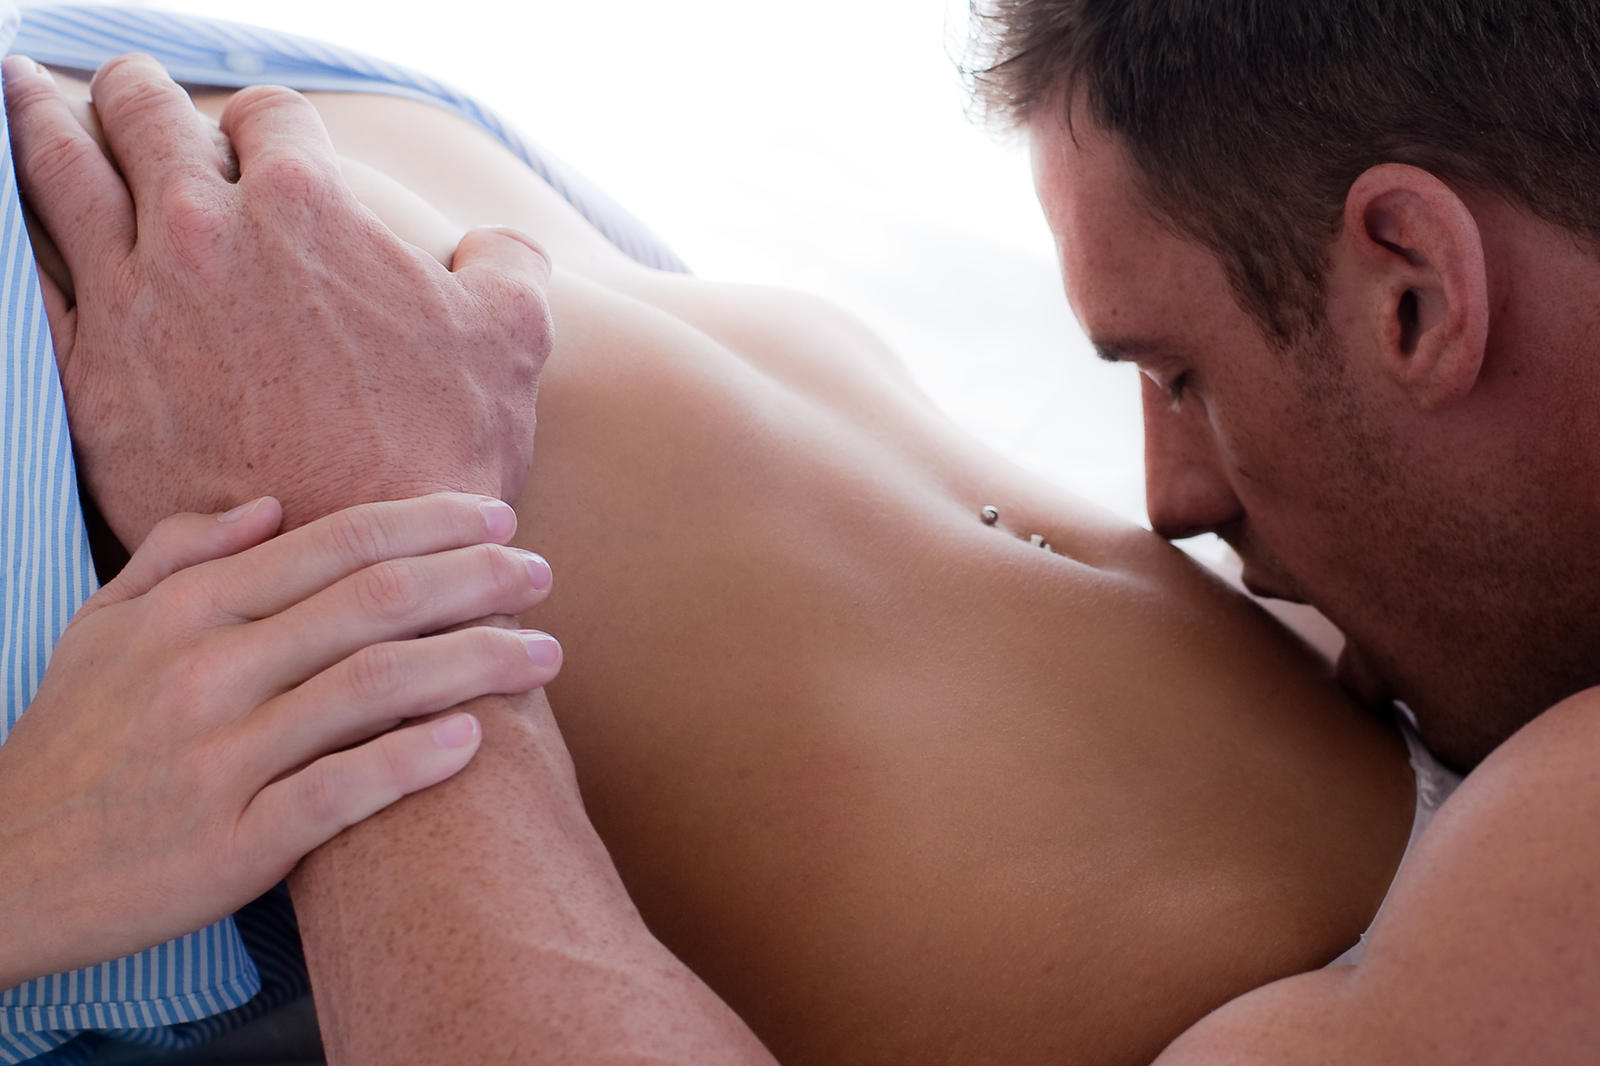 фото эротика мужчина целует женщину